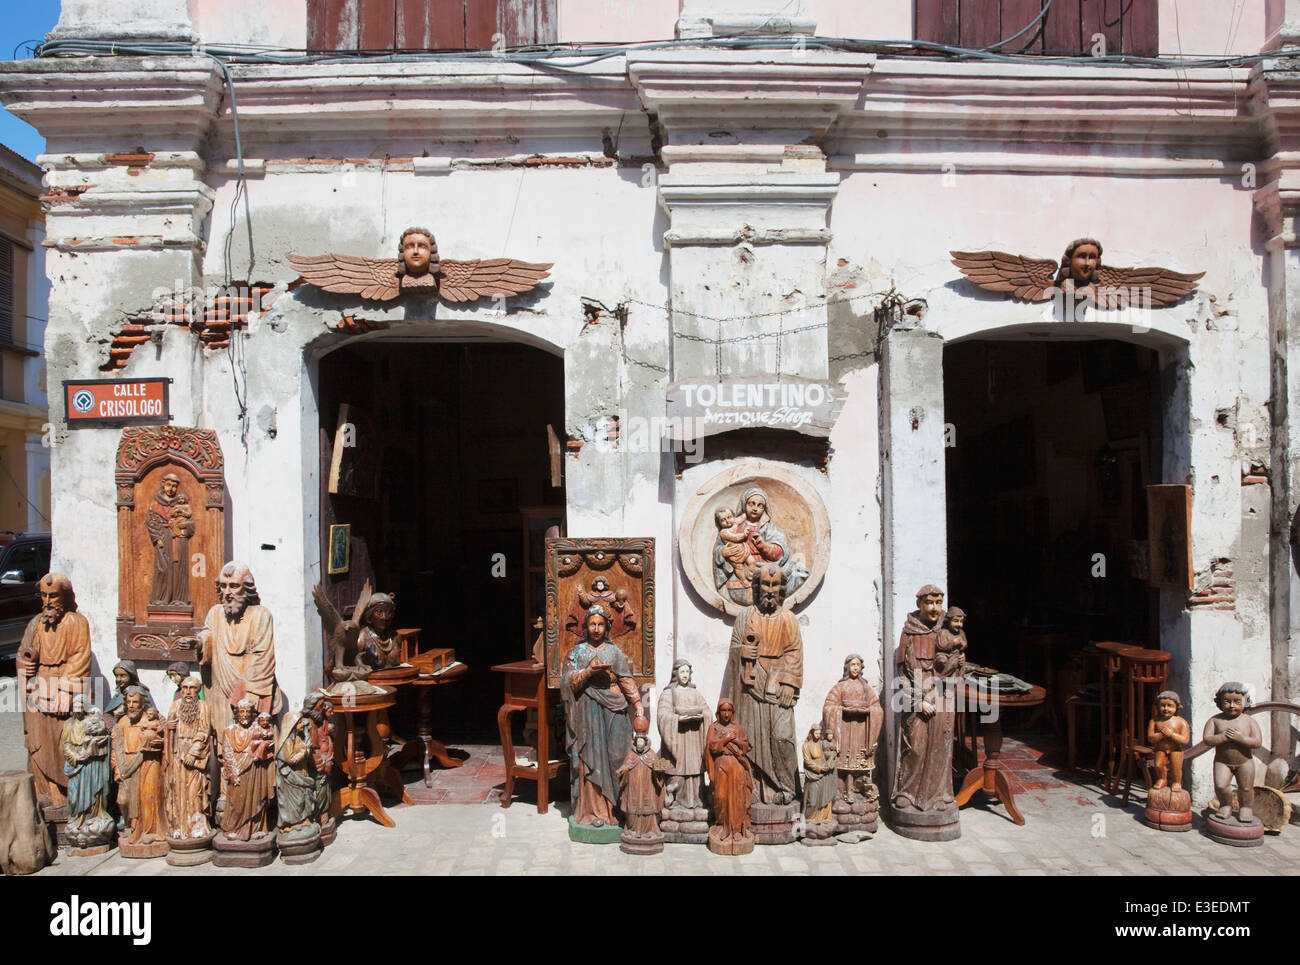 Antiques for sale Calle Crisologo, Vigan, Ilocos Sur, Northern Luzon, Philippines. - Stock Image